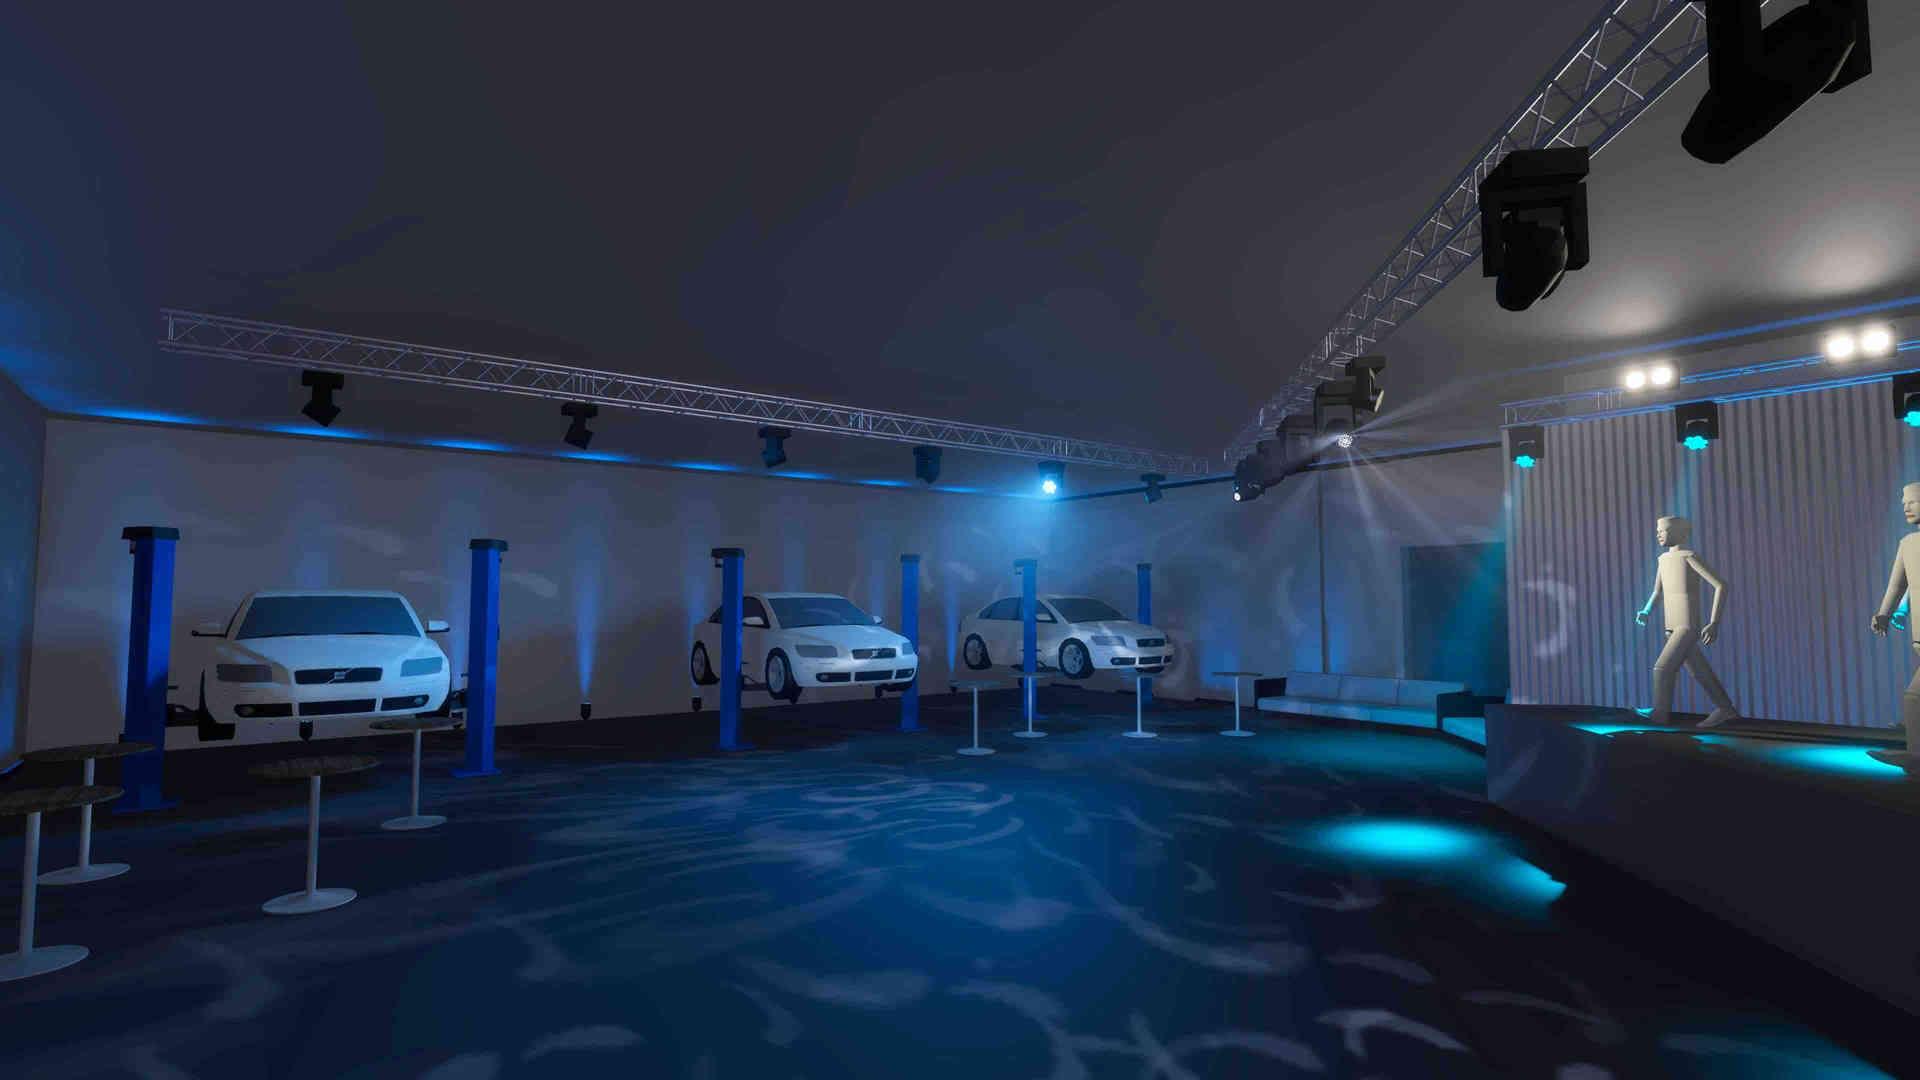 CarProductionSetupLightingStage 01.jpg